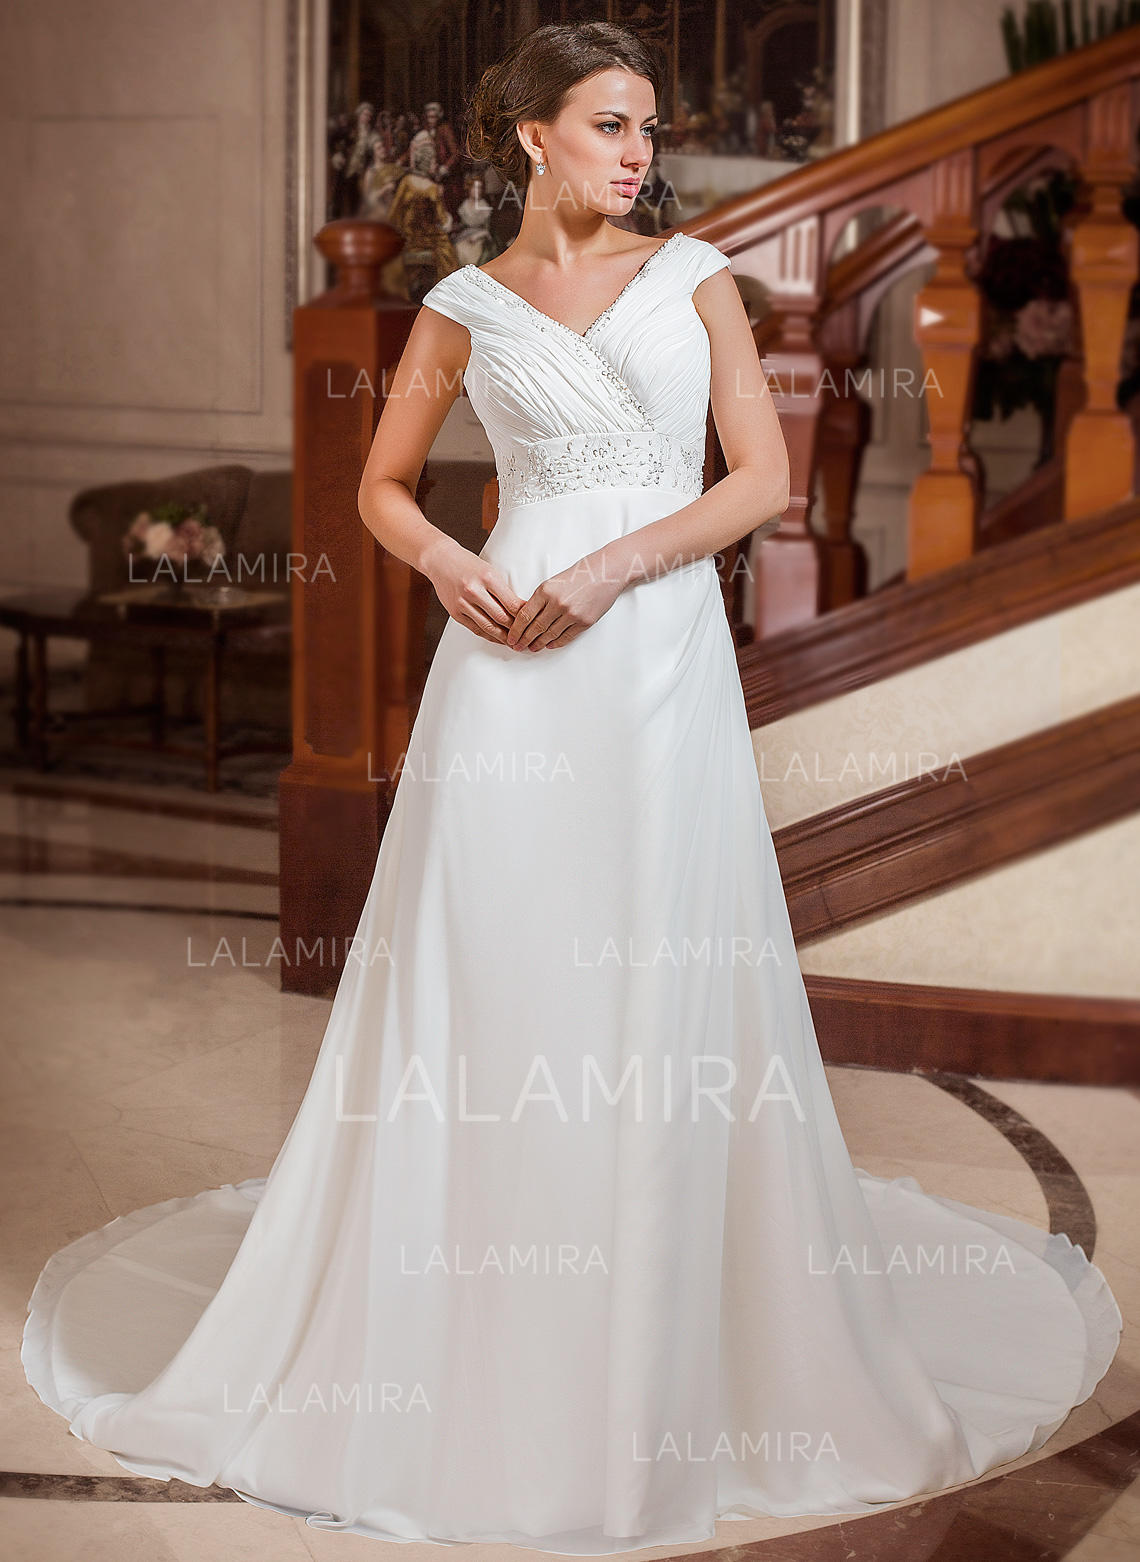 52ebccf08f7 Sweetheart A-Line Princess Wedding Dresses Chiffon Ruffle Beading  Sleeveless Chapel Train (002211288. Loading zoom